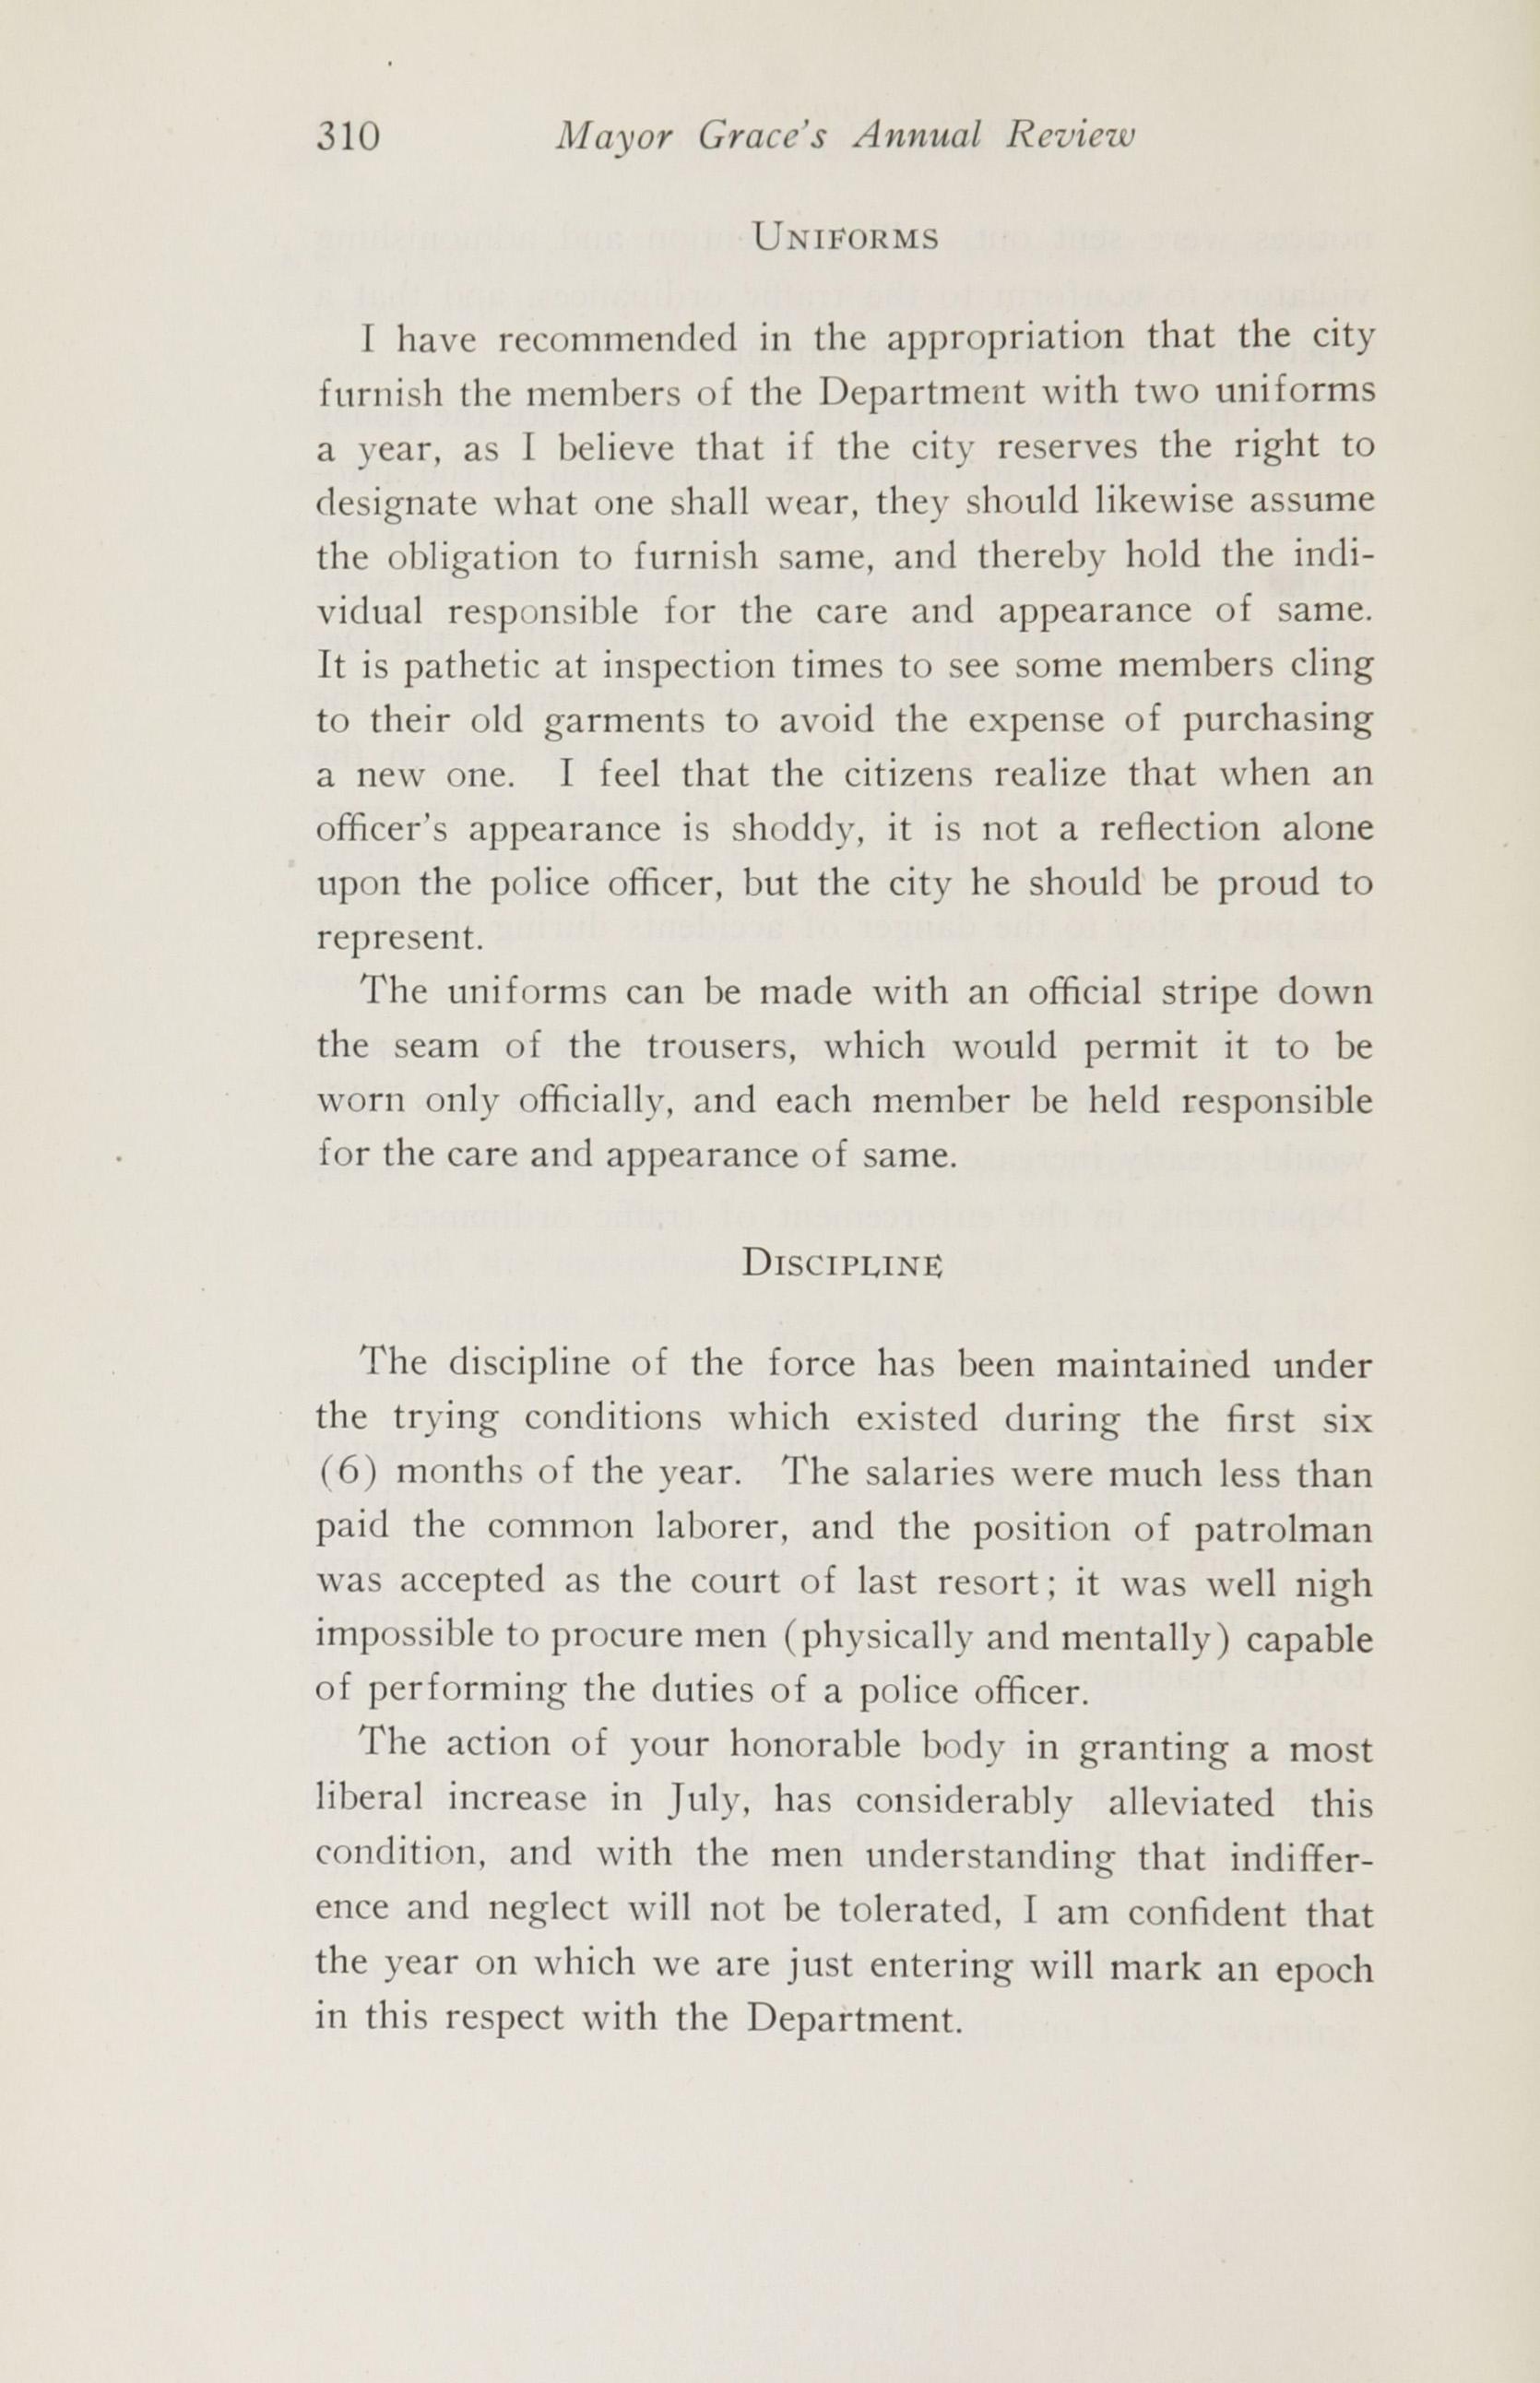 Charleston Yearbook, 1920, page 310